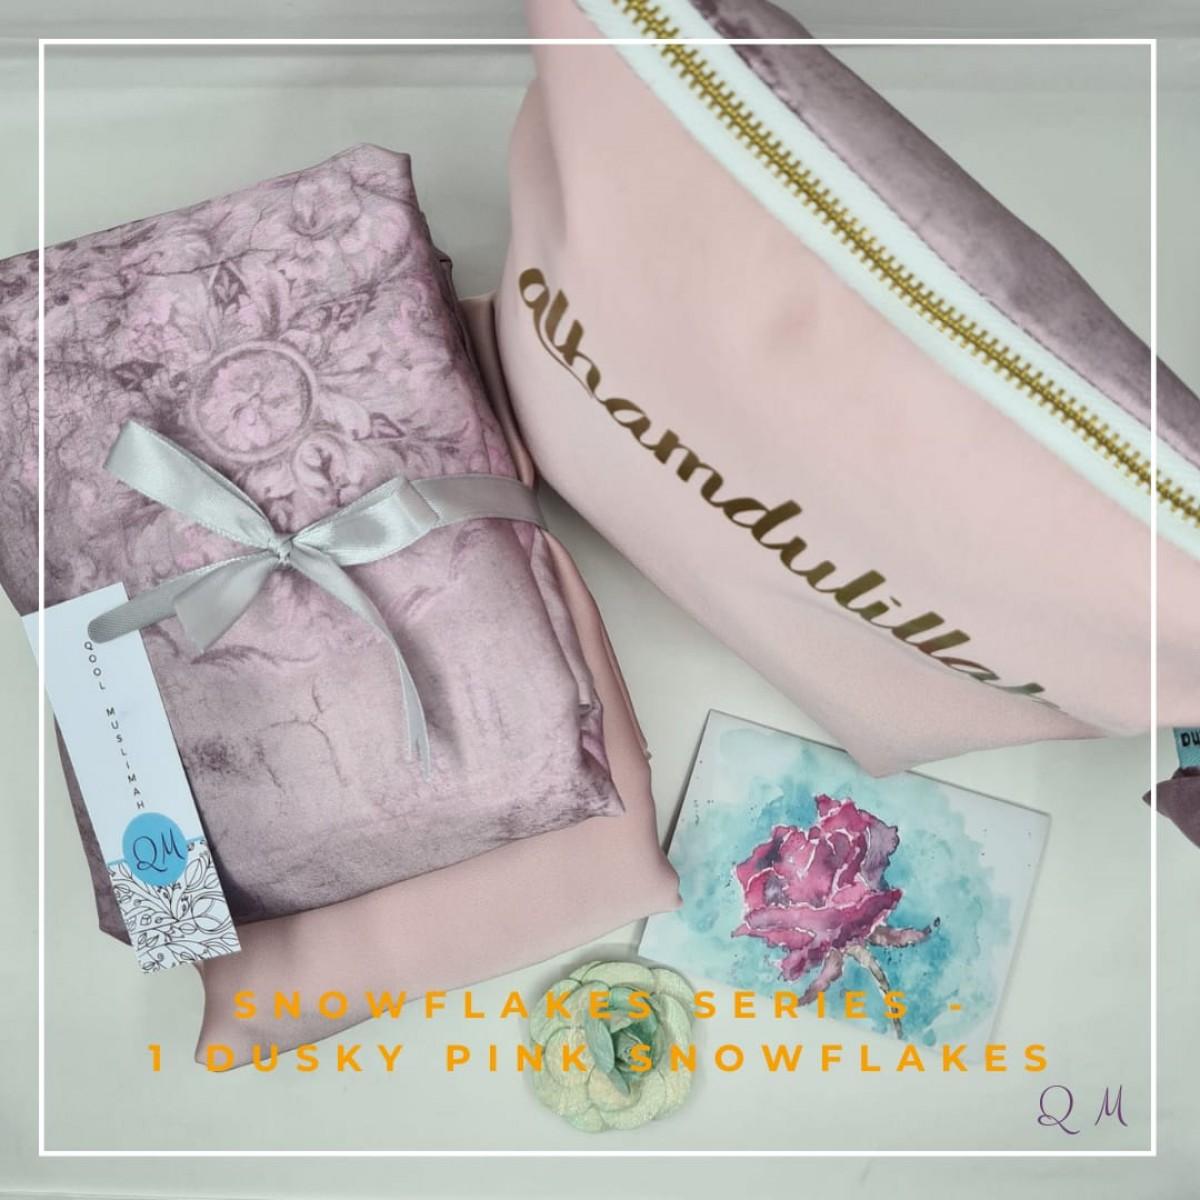 P16. Telekung/Mukena Armani Silk Snowflakes-Dusky Pink Snowflakes - Qool Muslimah